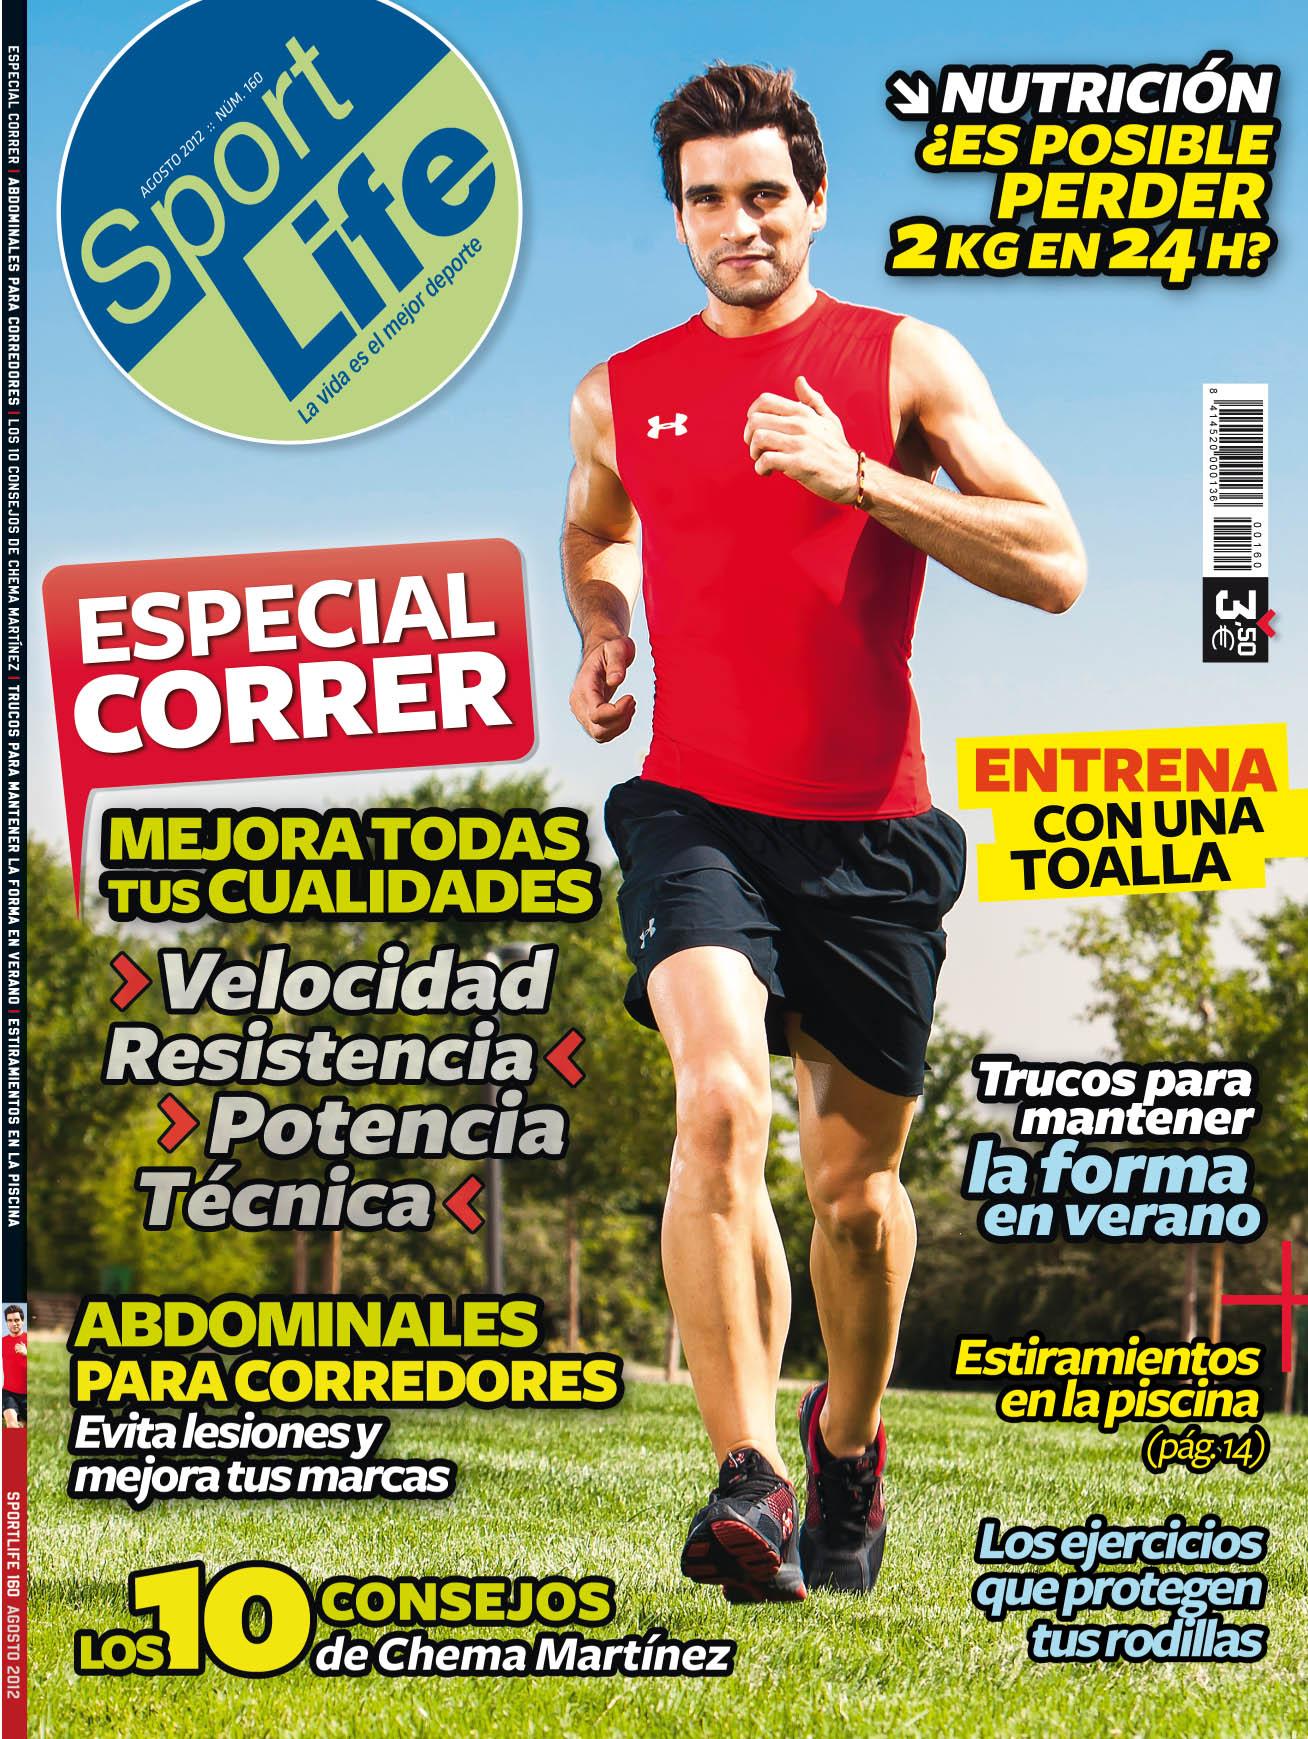 Sumario Sport Life 160 agosto 2012